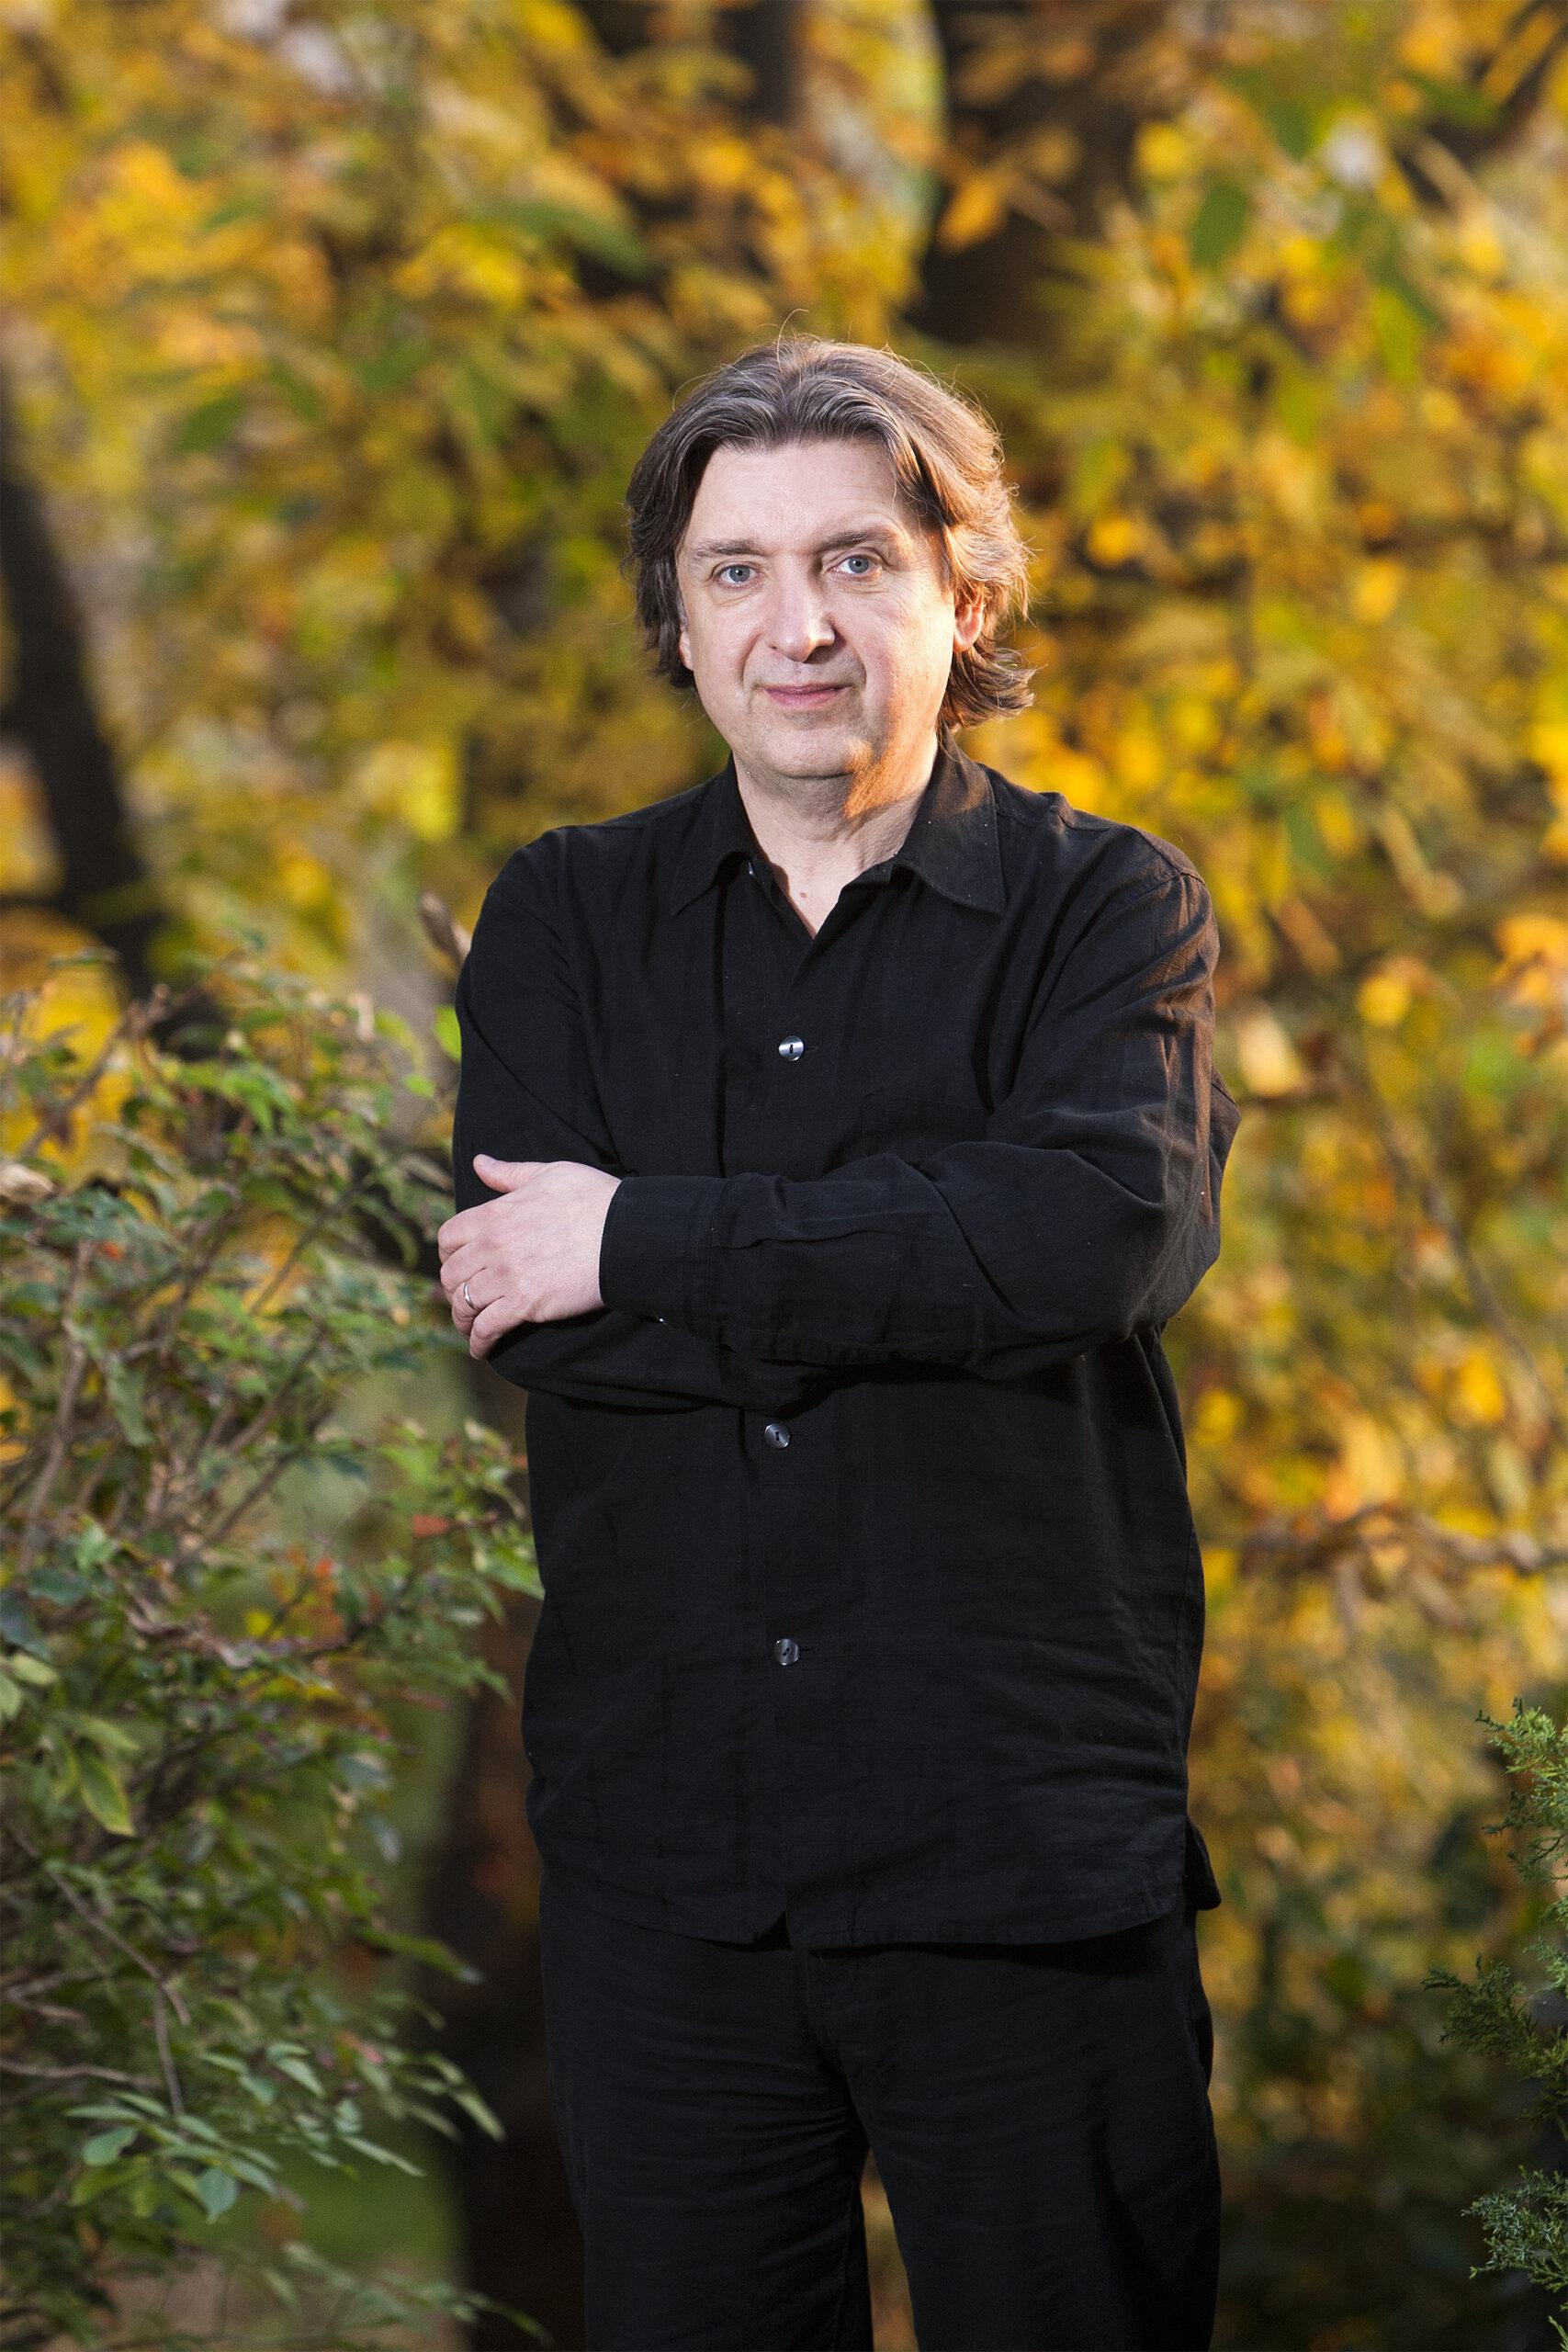 Zagreb, 06.11.2015 - Portret Srecka Bradica u njegovom domu